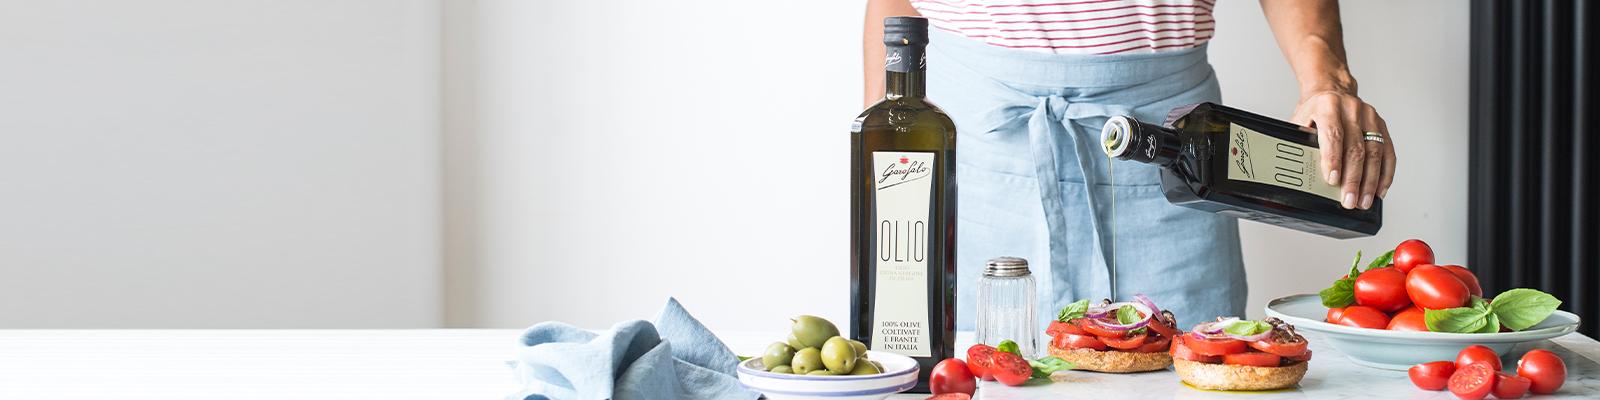 Pasta Garofalo - Extra-Virgin Olive Oil